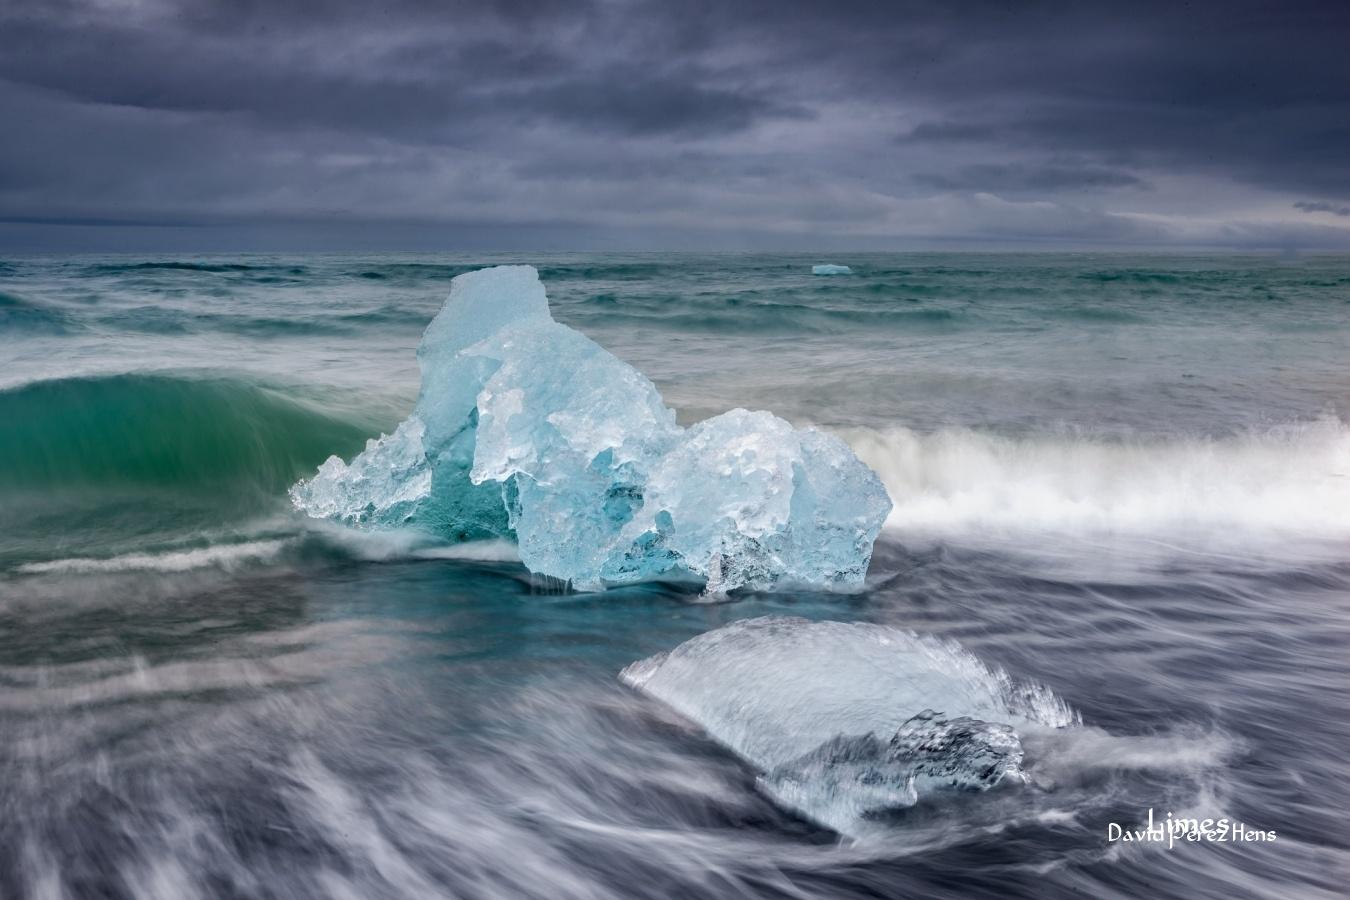 Playas con hielo - Islandia. - Limes , David Pérez Hens